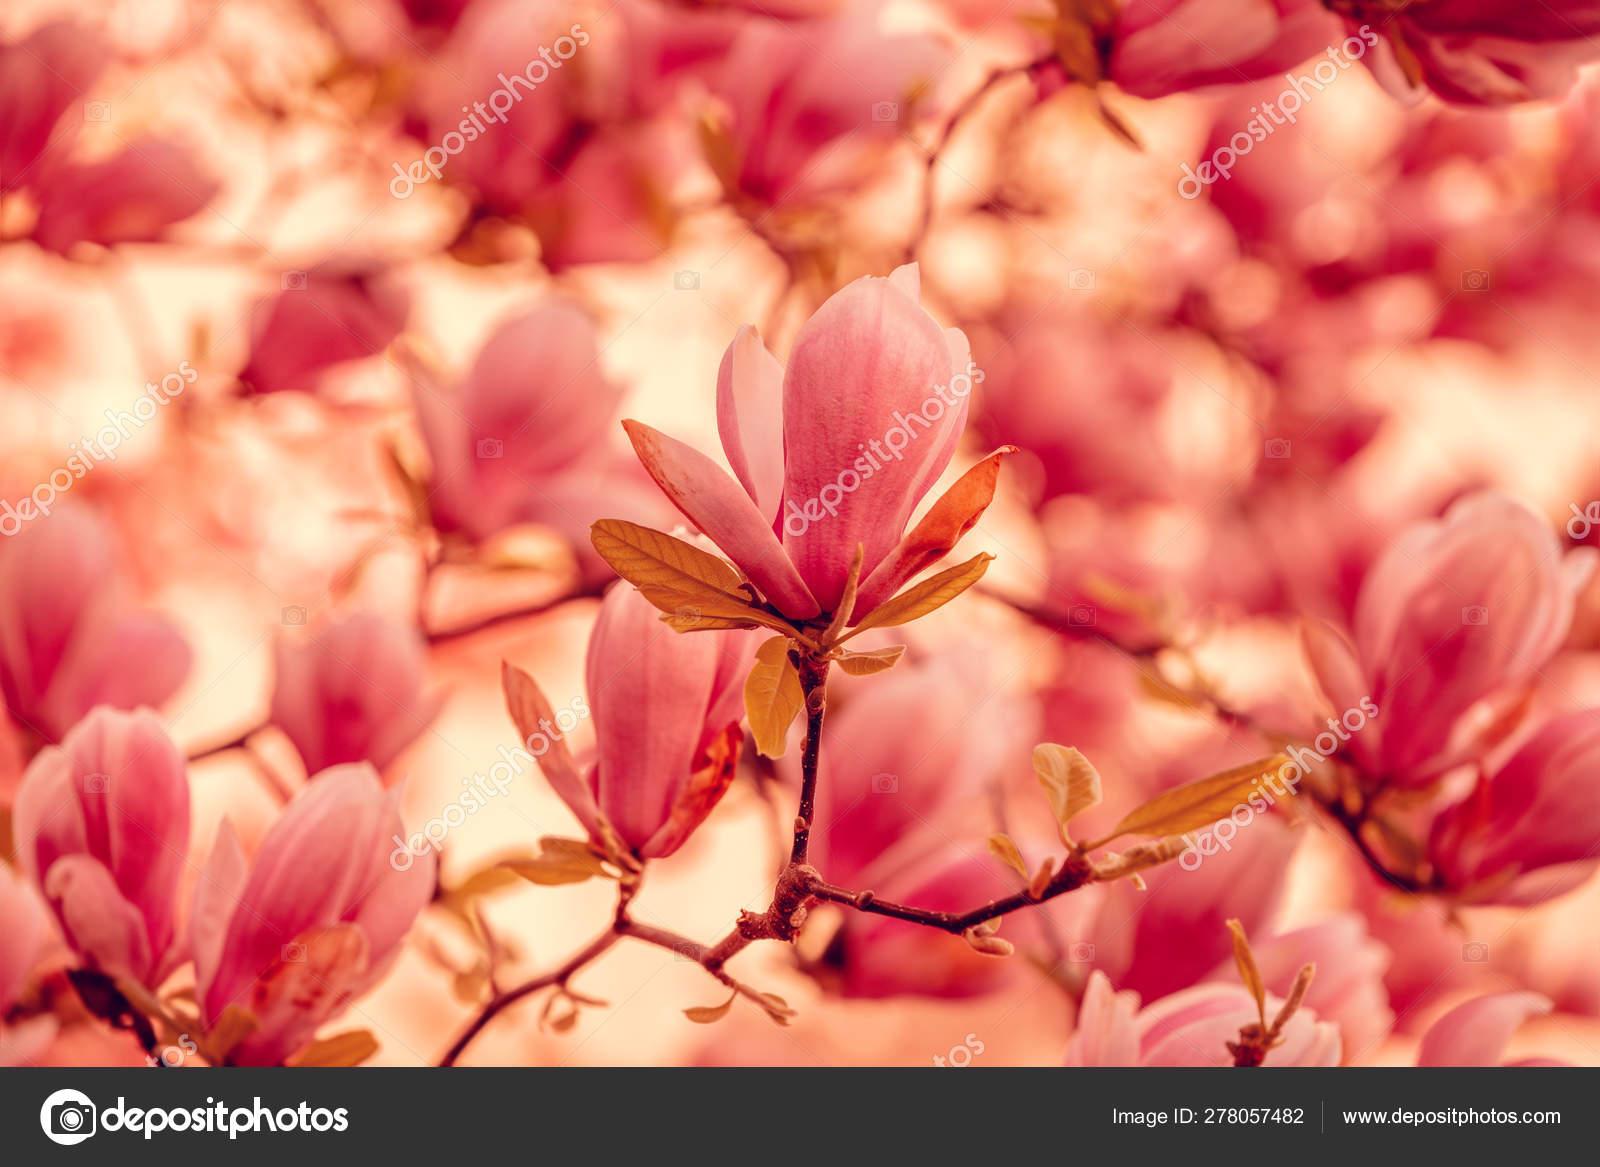 Magnolia Florescente Vintage Arvore Parque Primavera Stock Photo C Vvvita 278057482